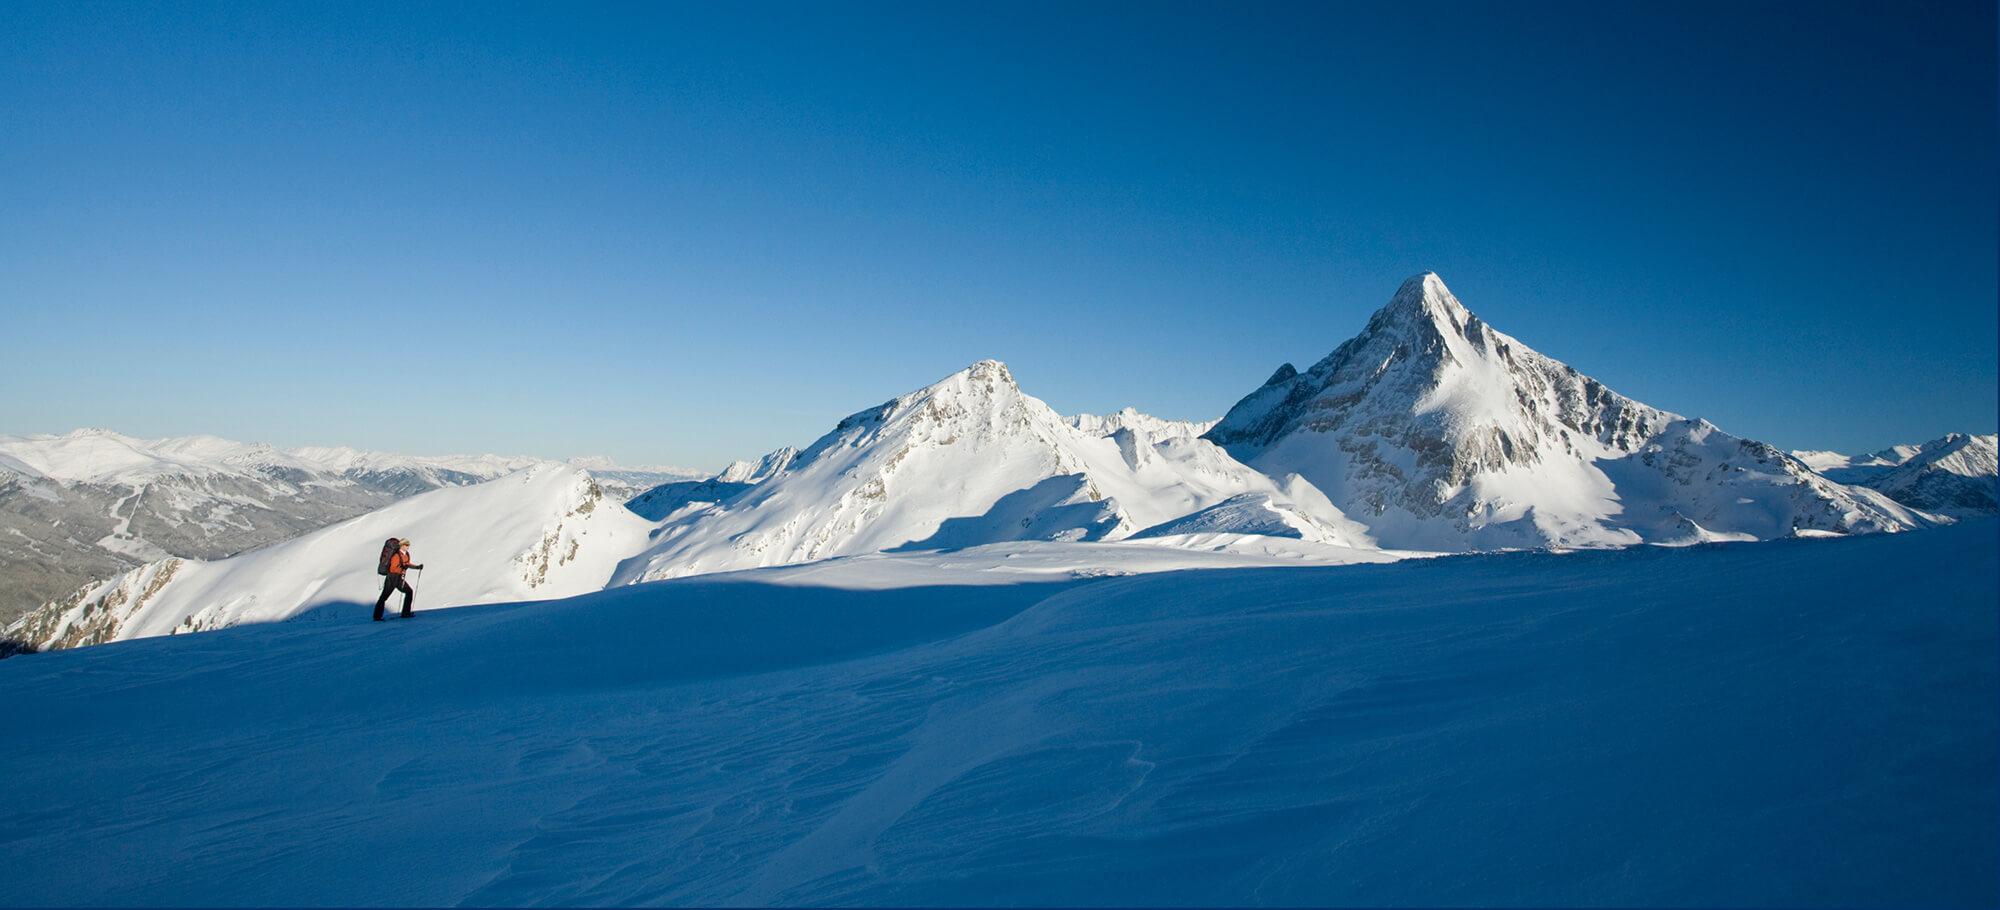 Skitourengeher im Zillertal